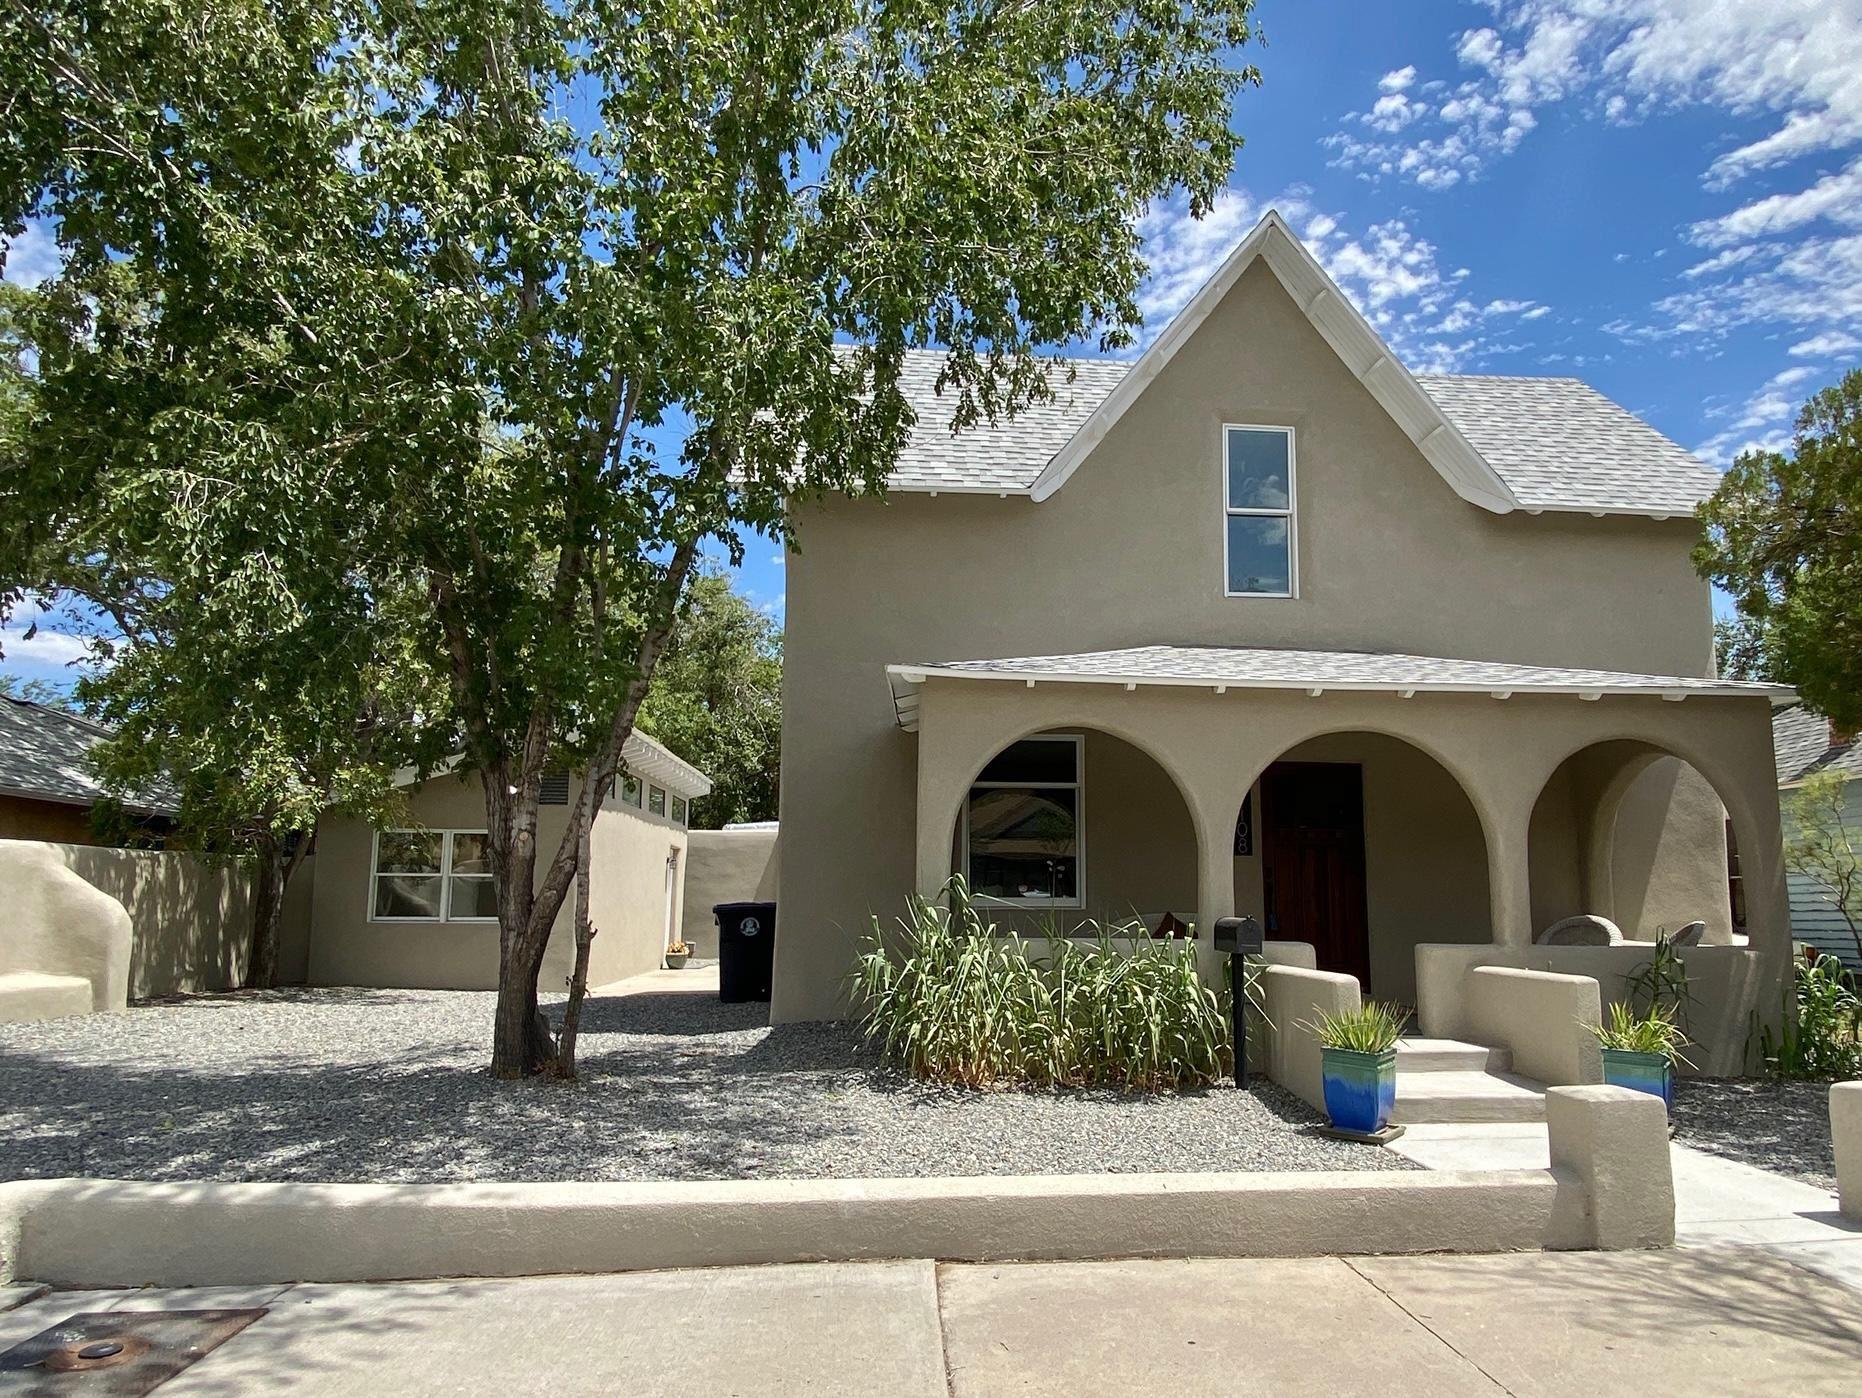 1108 8th Street NW, Albuquerque, NM 87102 - #: 974504